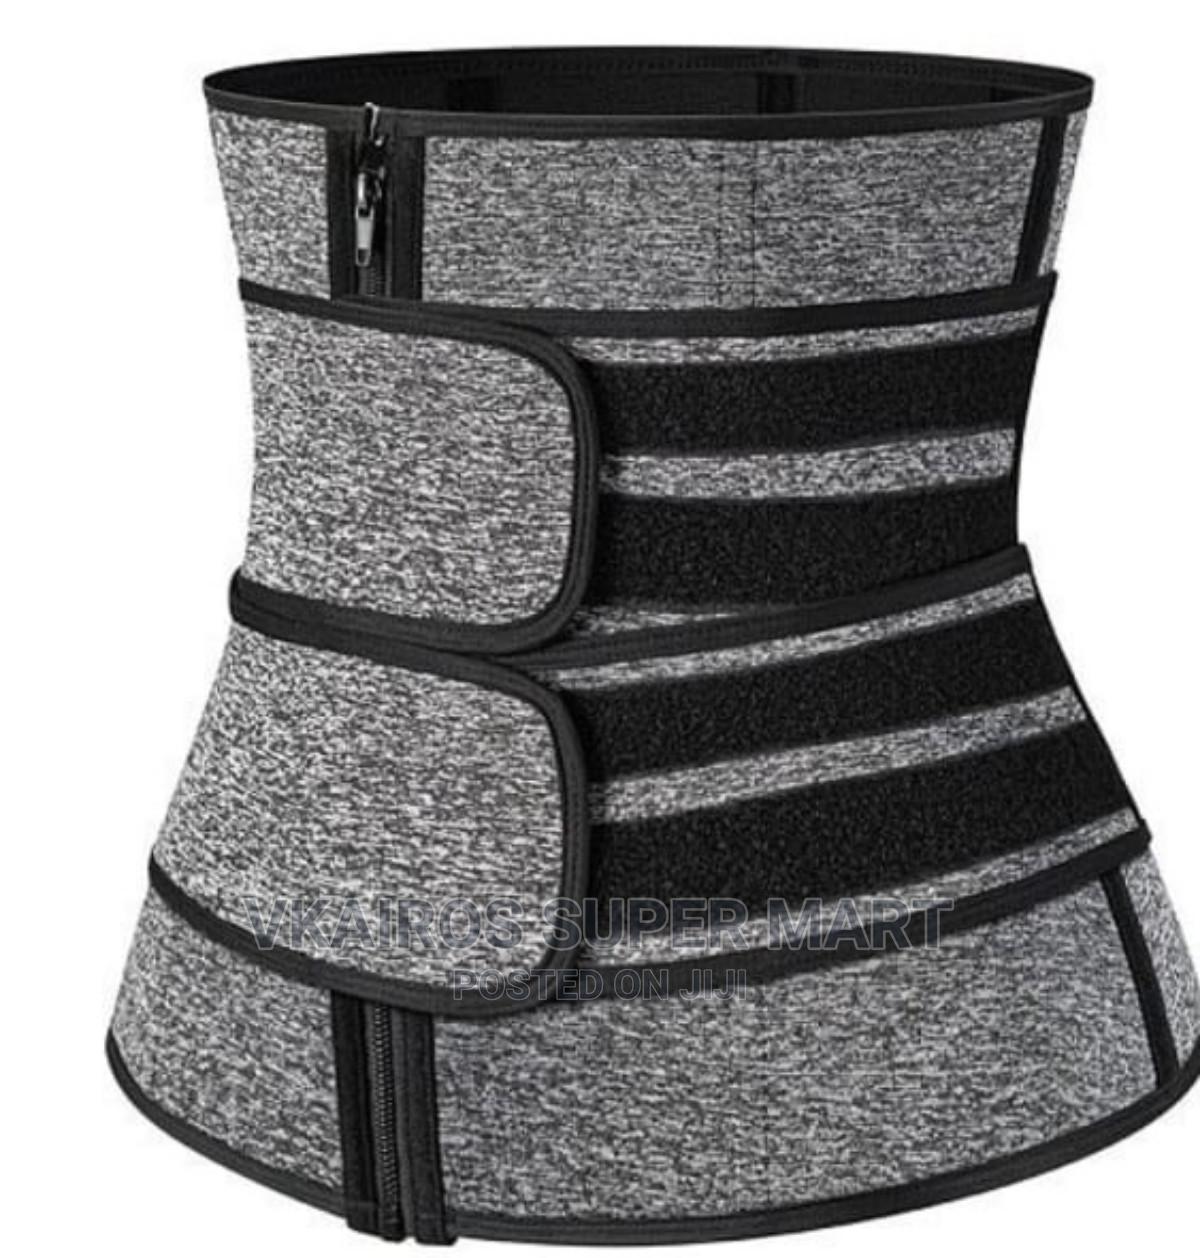 Tummy Shaper Underburst Corset Belt - Sizes M,L,XL,XXL 3XL